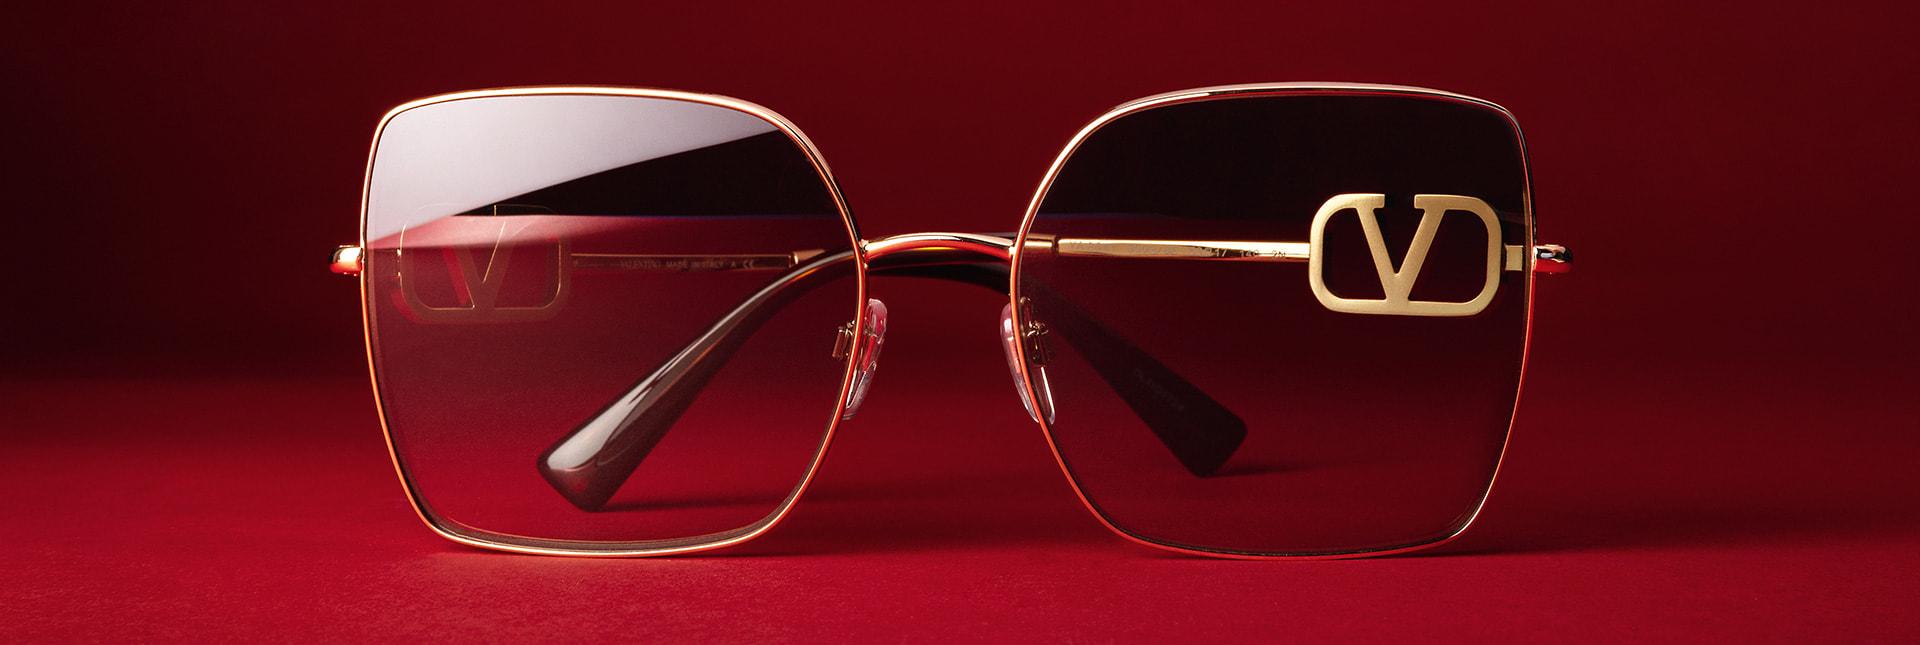 Valentino® Sunglasses